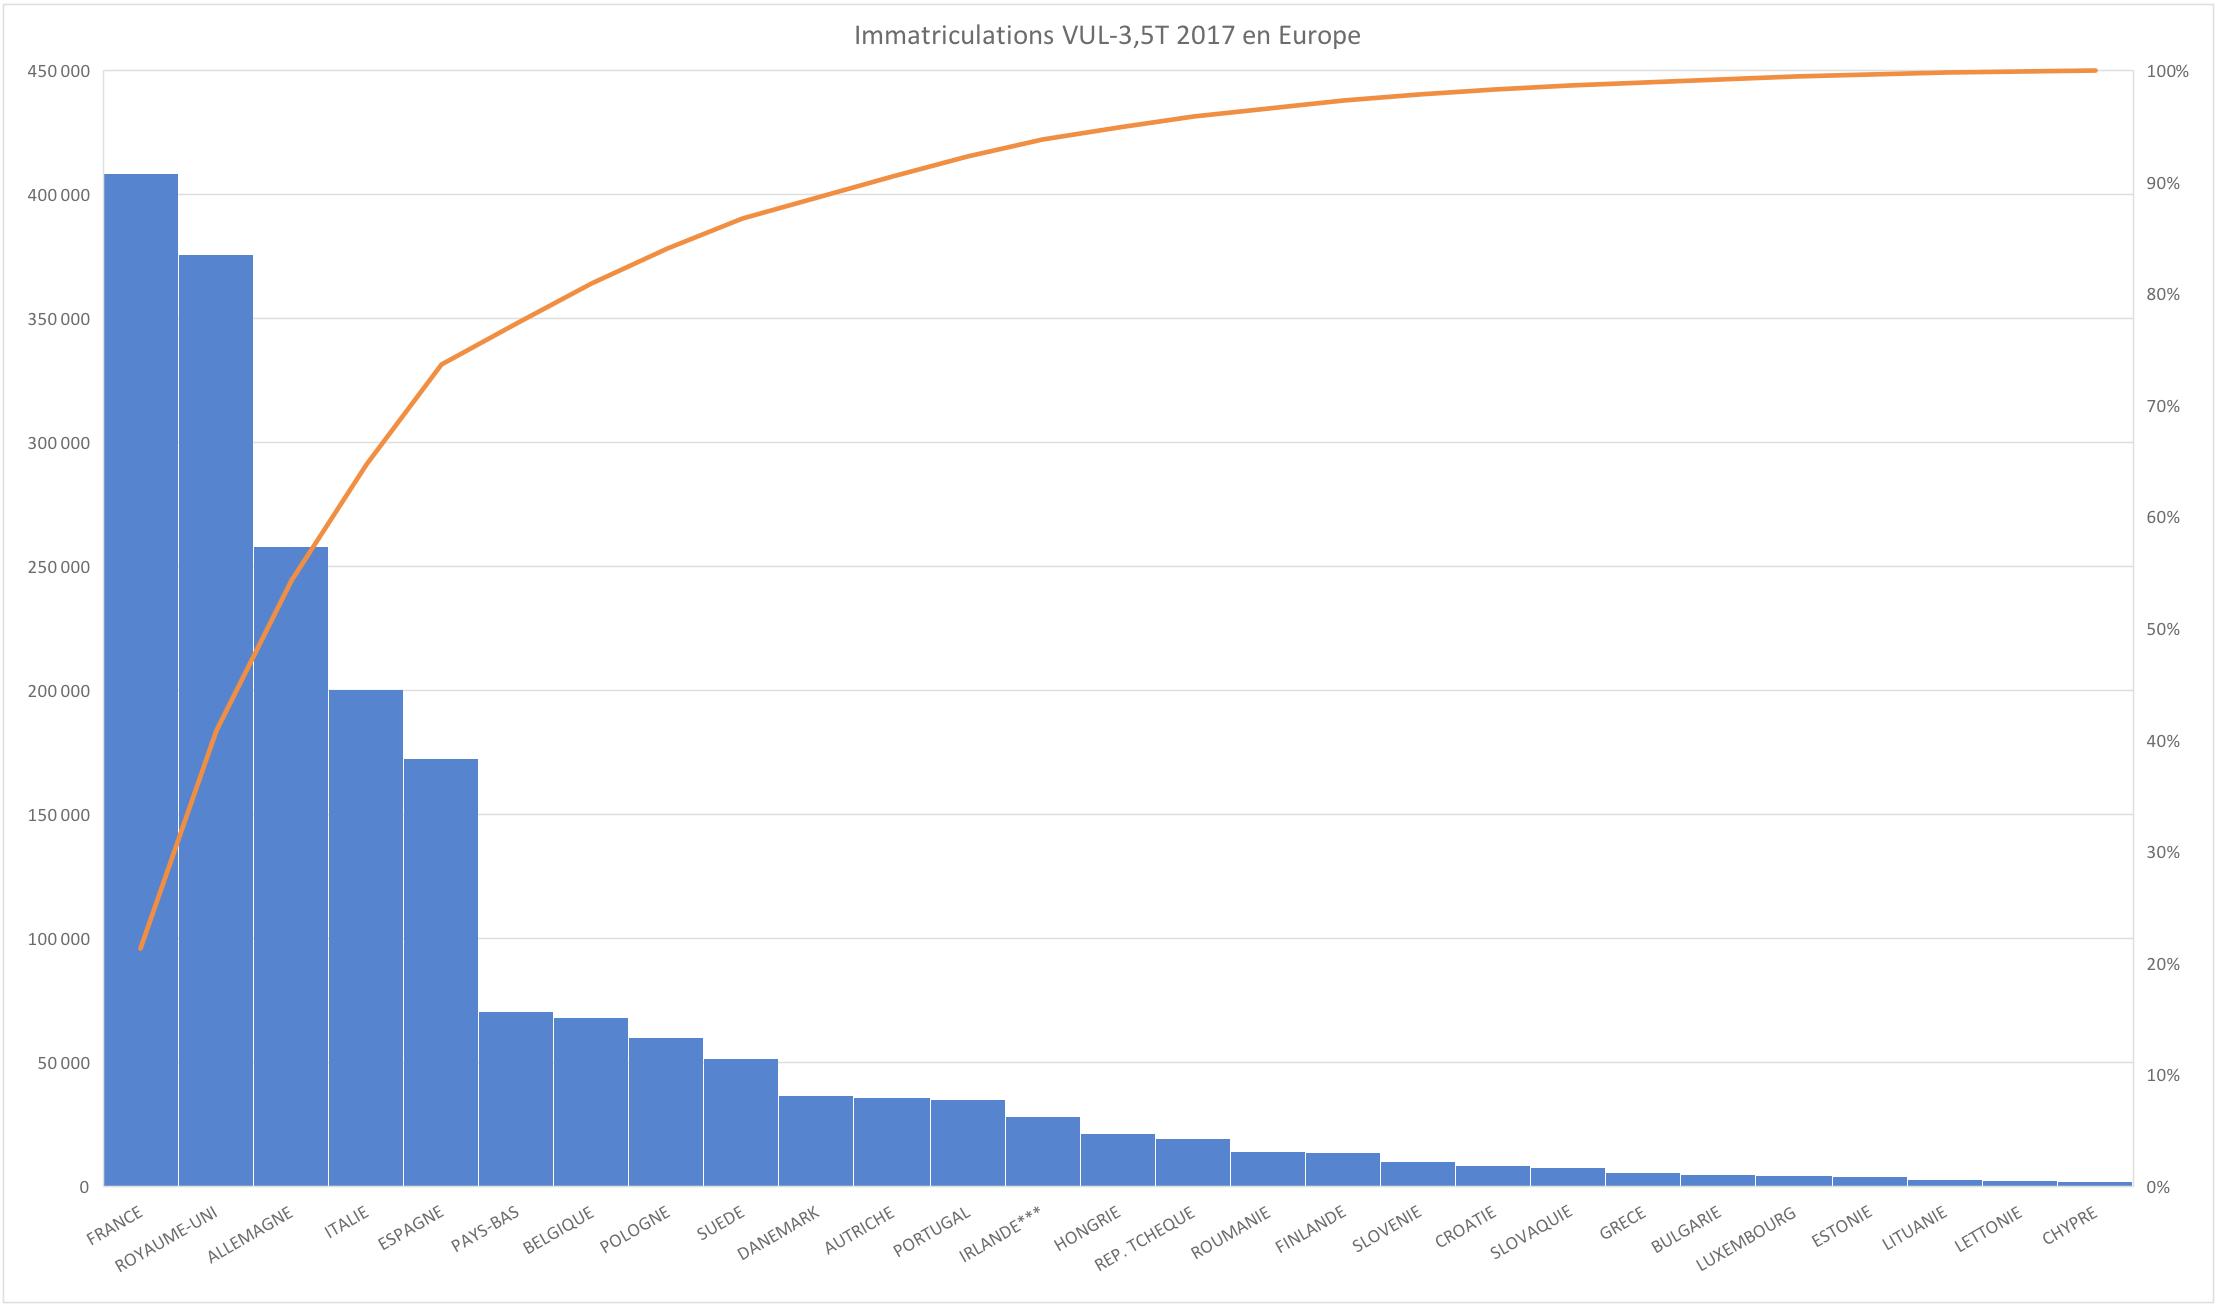 Immatriculations Véhicules Utilitaires en 2017 en Europe